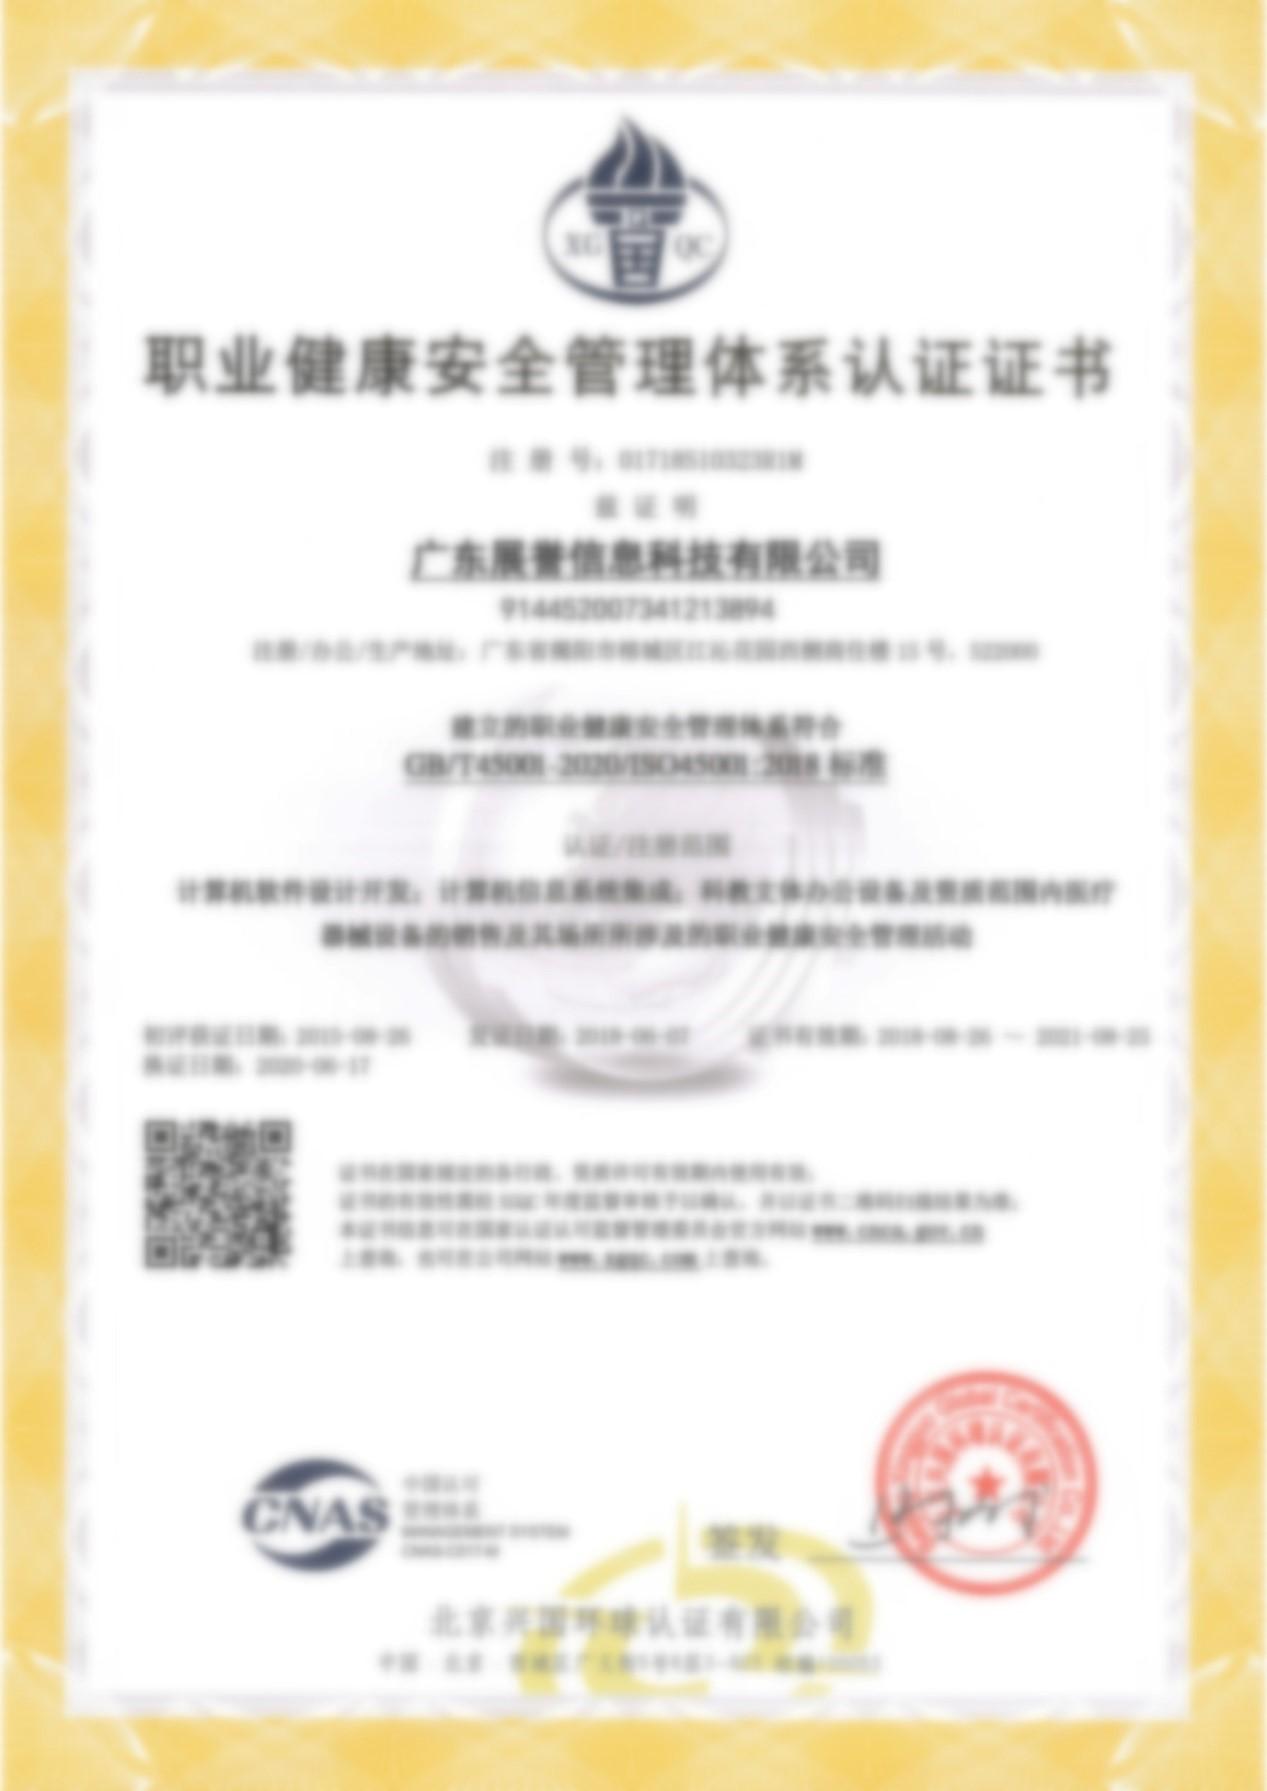 title='职业健康安全管理体系认证证书'